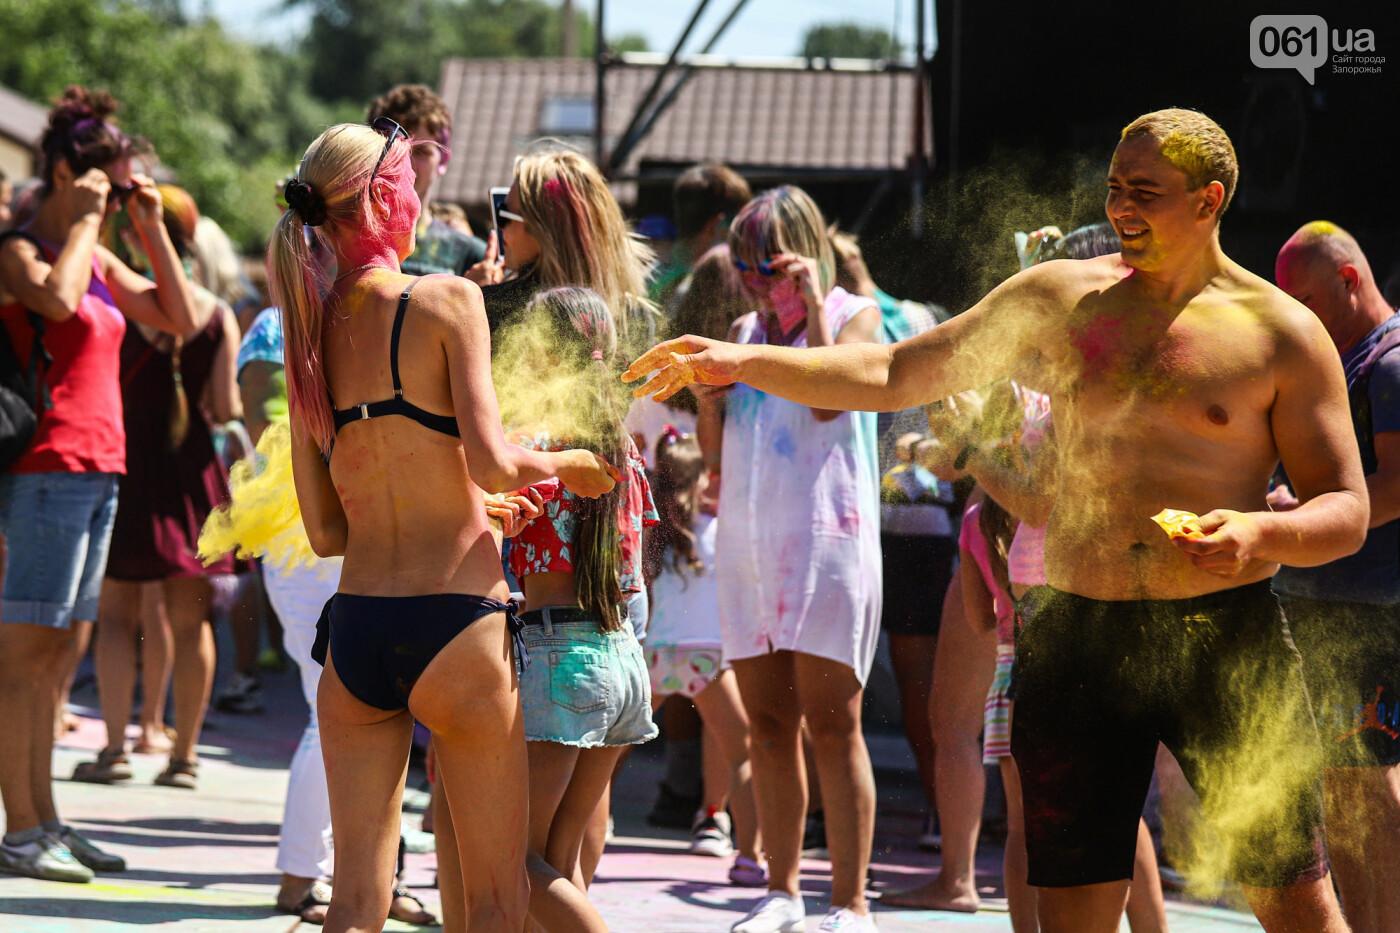 Сотни запорожцев приняли участие в фестивале красок Холи, - ФОТОРЕПОРТАЖ, фото-3